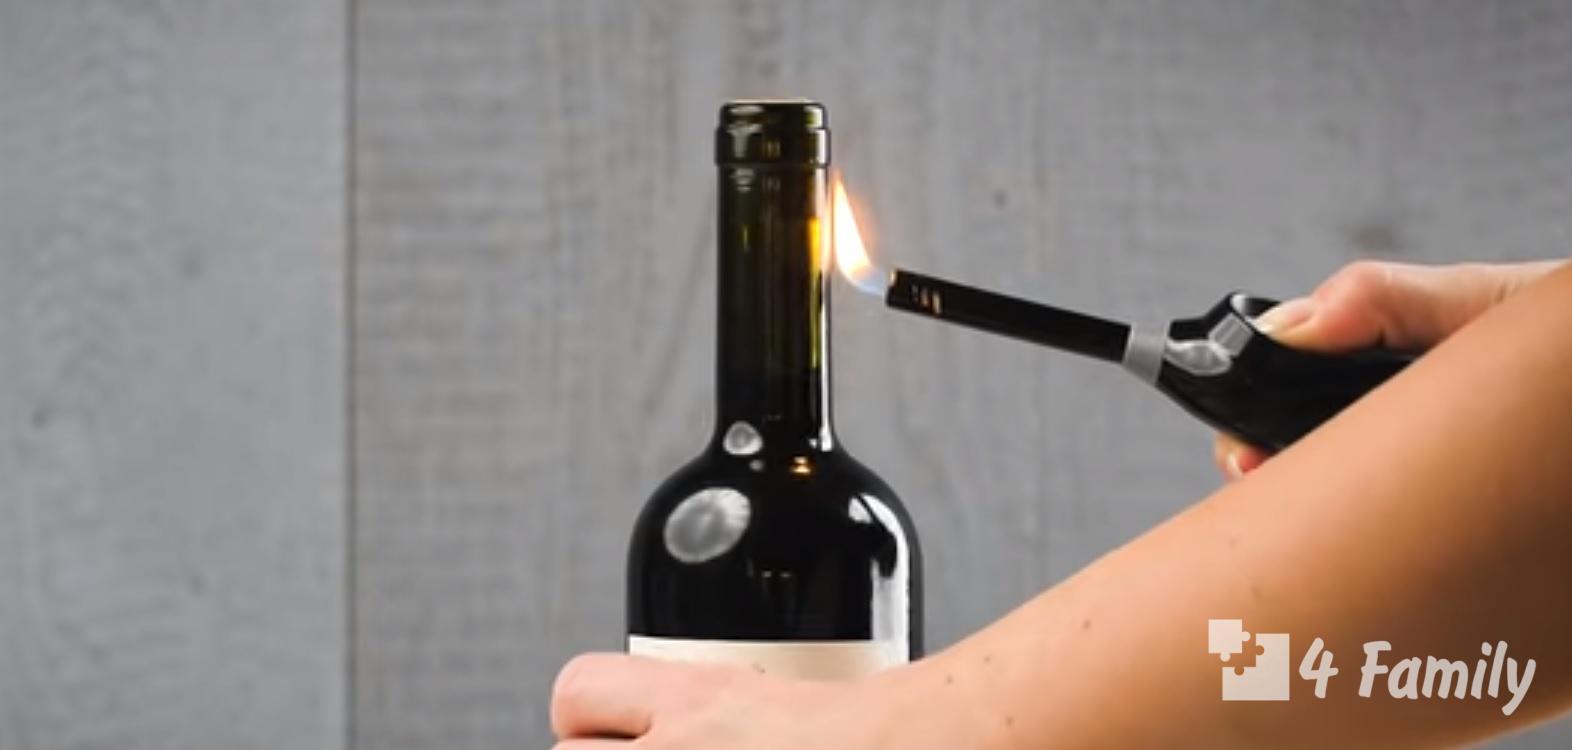 4family Лайфхак: как открыть вино без штопора